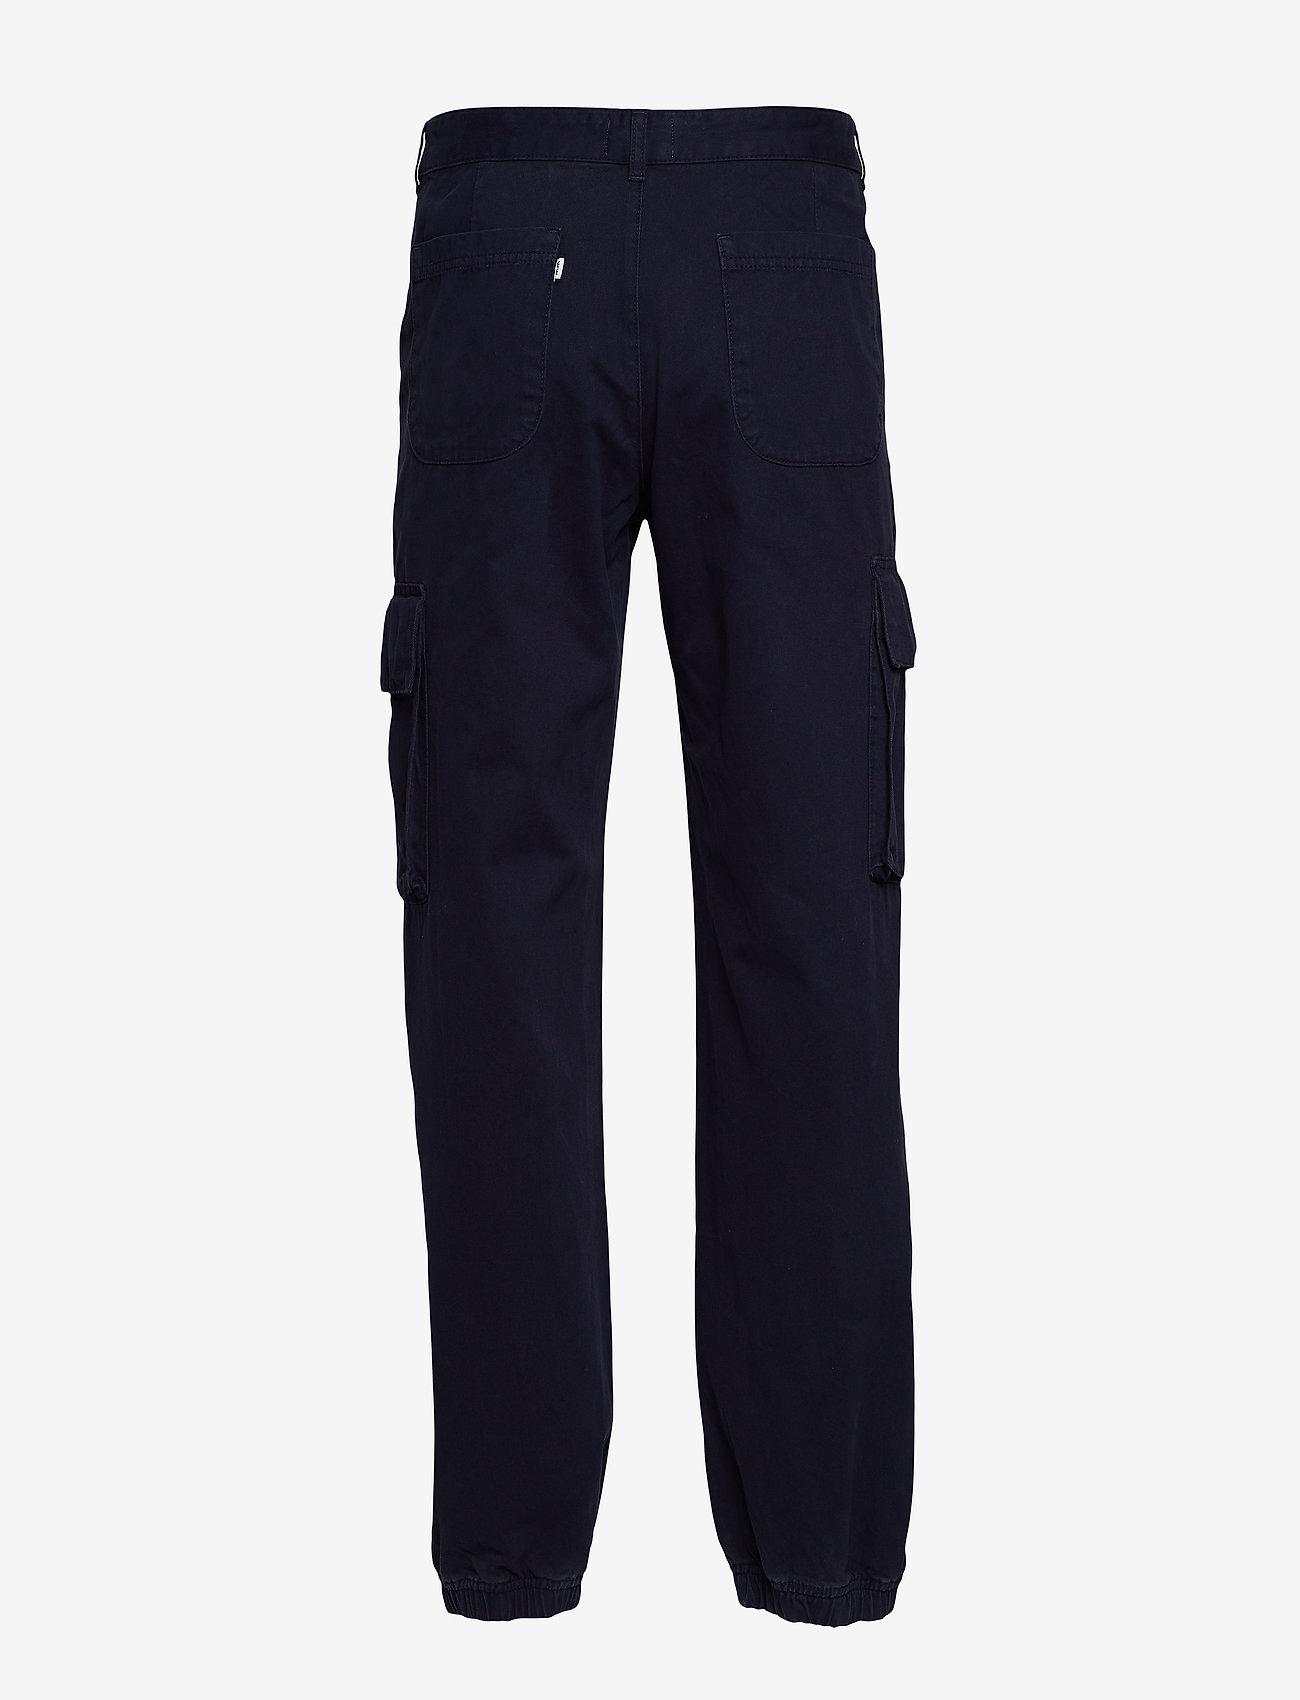 Wood Wood - Eigil trousers - bojówki - navy - 1